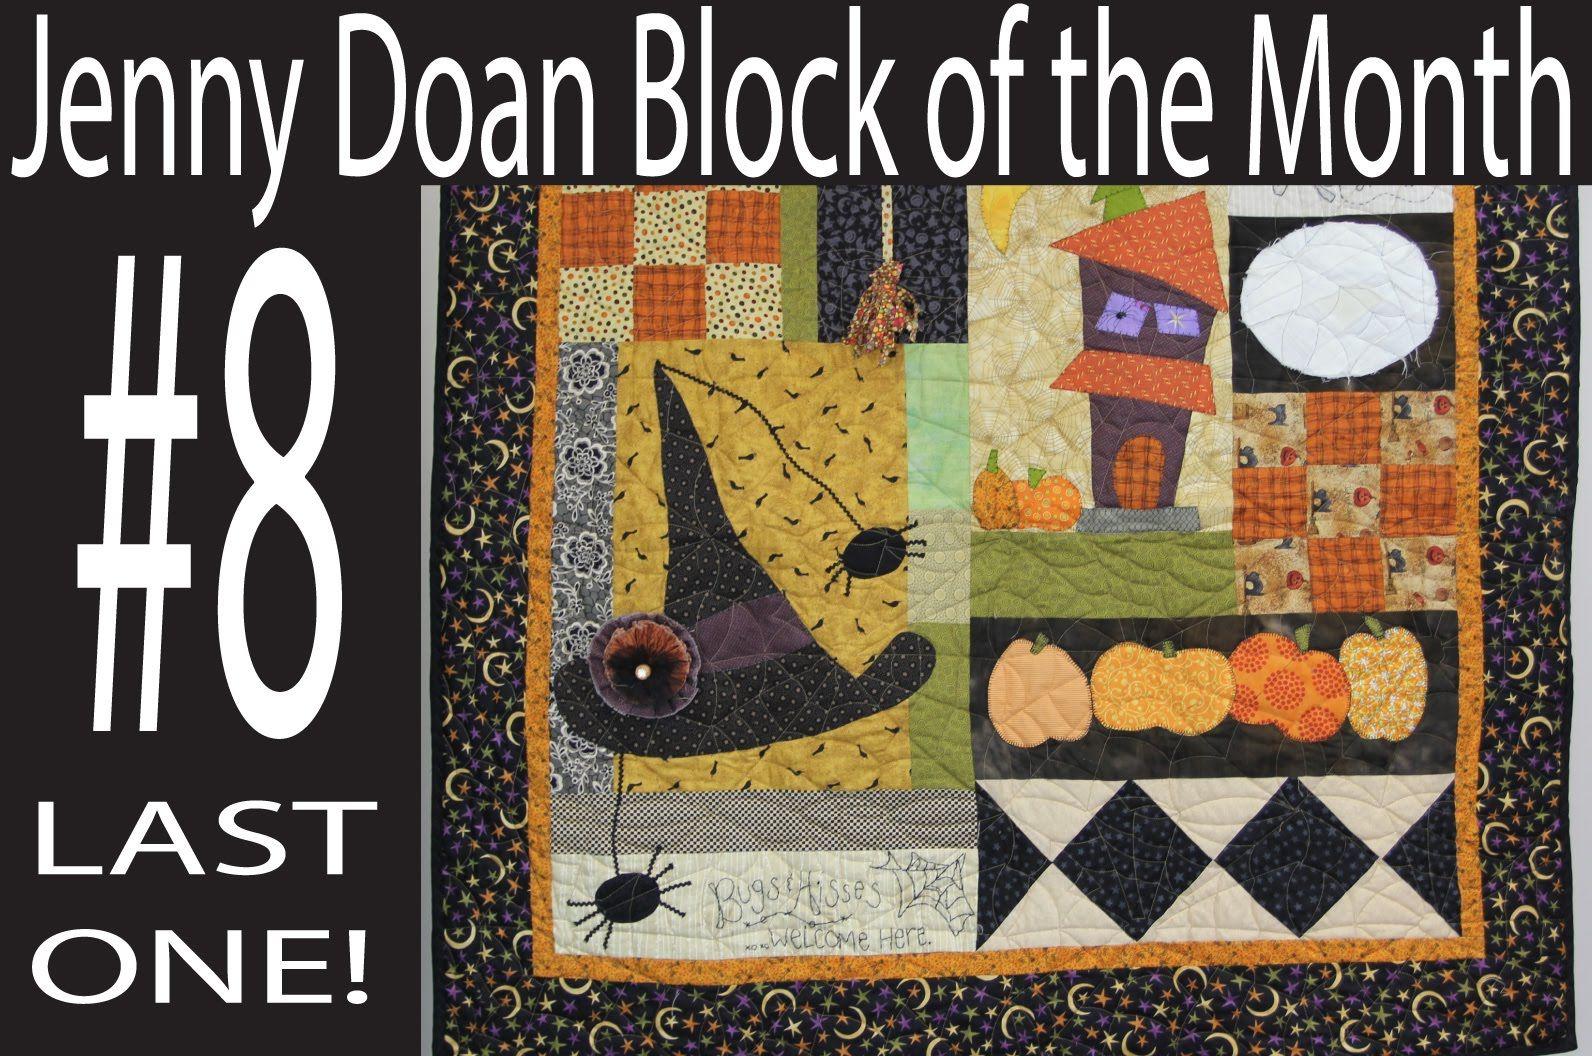 Jenny doan block of the month botm 8 missouri star quilt company jenny doan block of the month botm 8 missouri star quilt company baditri Images